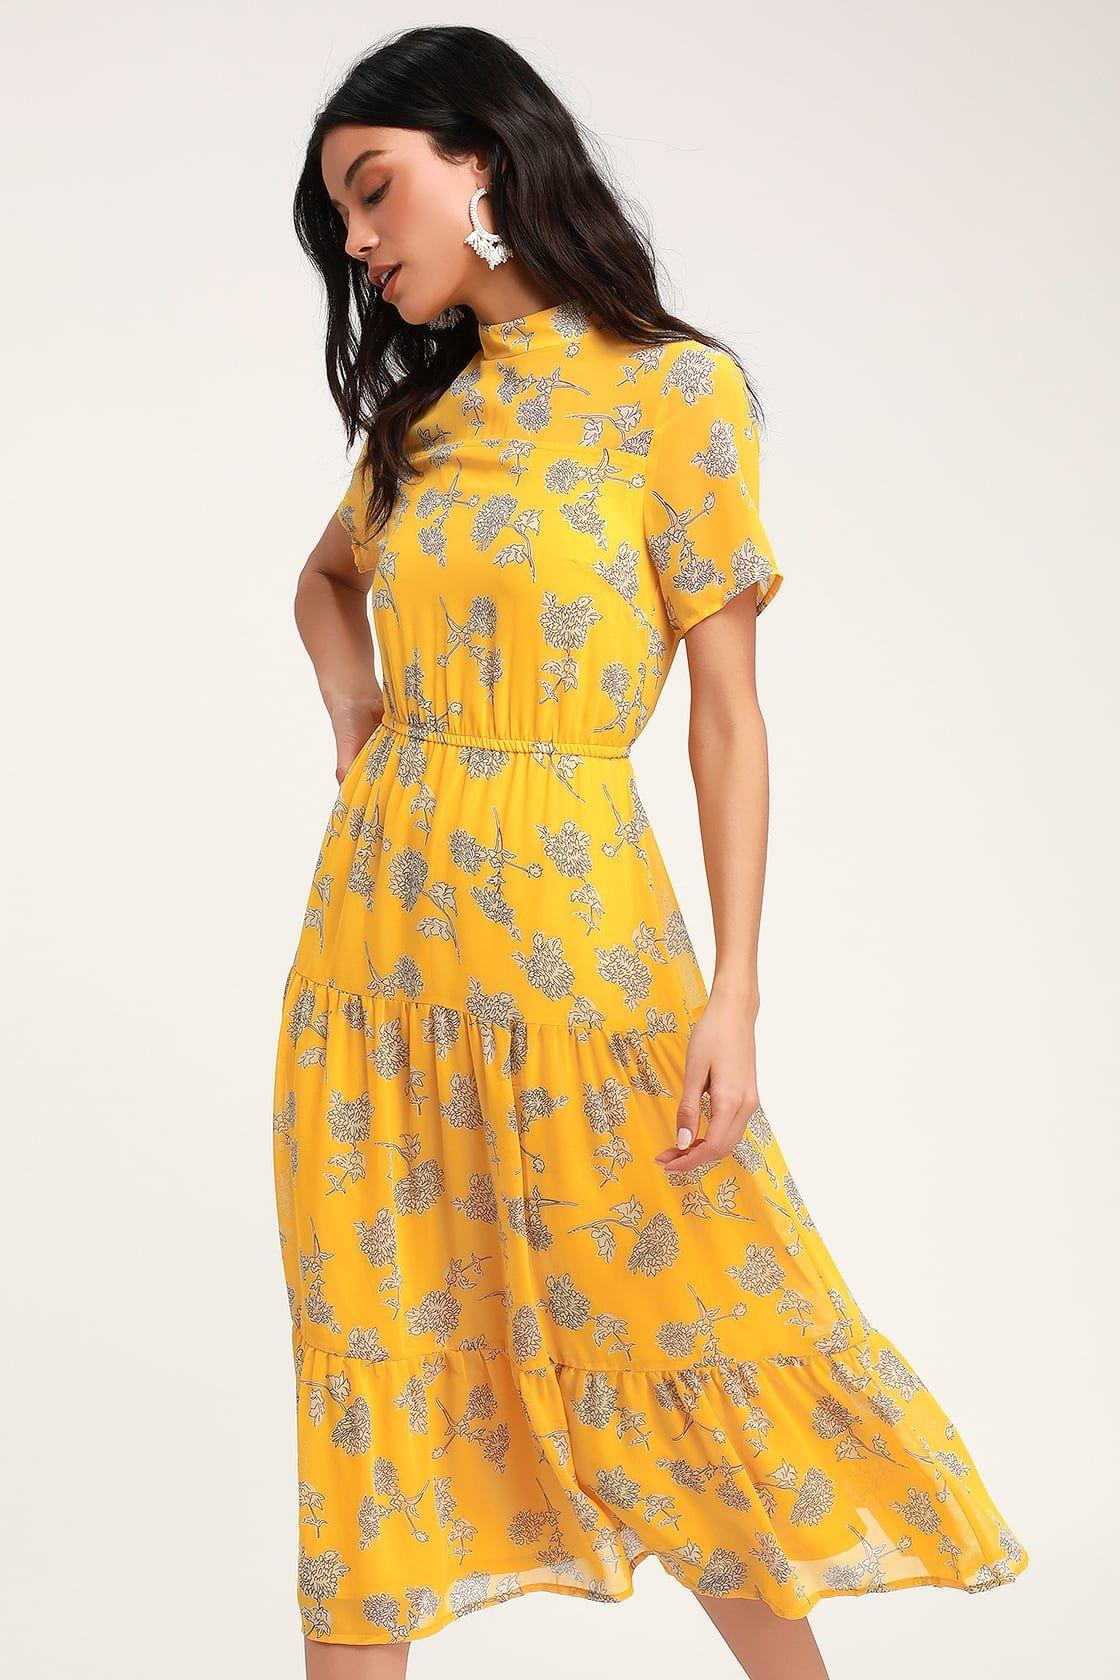 054fbc5baf007 Lulus | Floral Dressed Up Mustard Yellow Floral Print Midi Dress ...